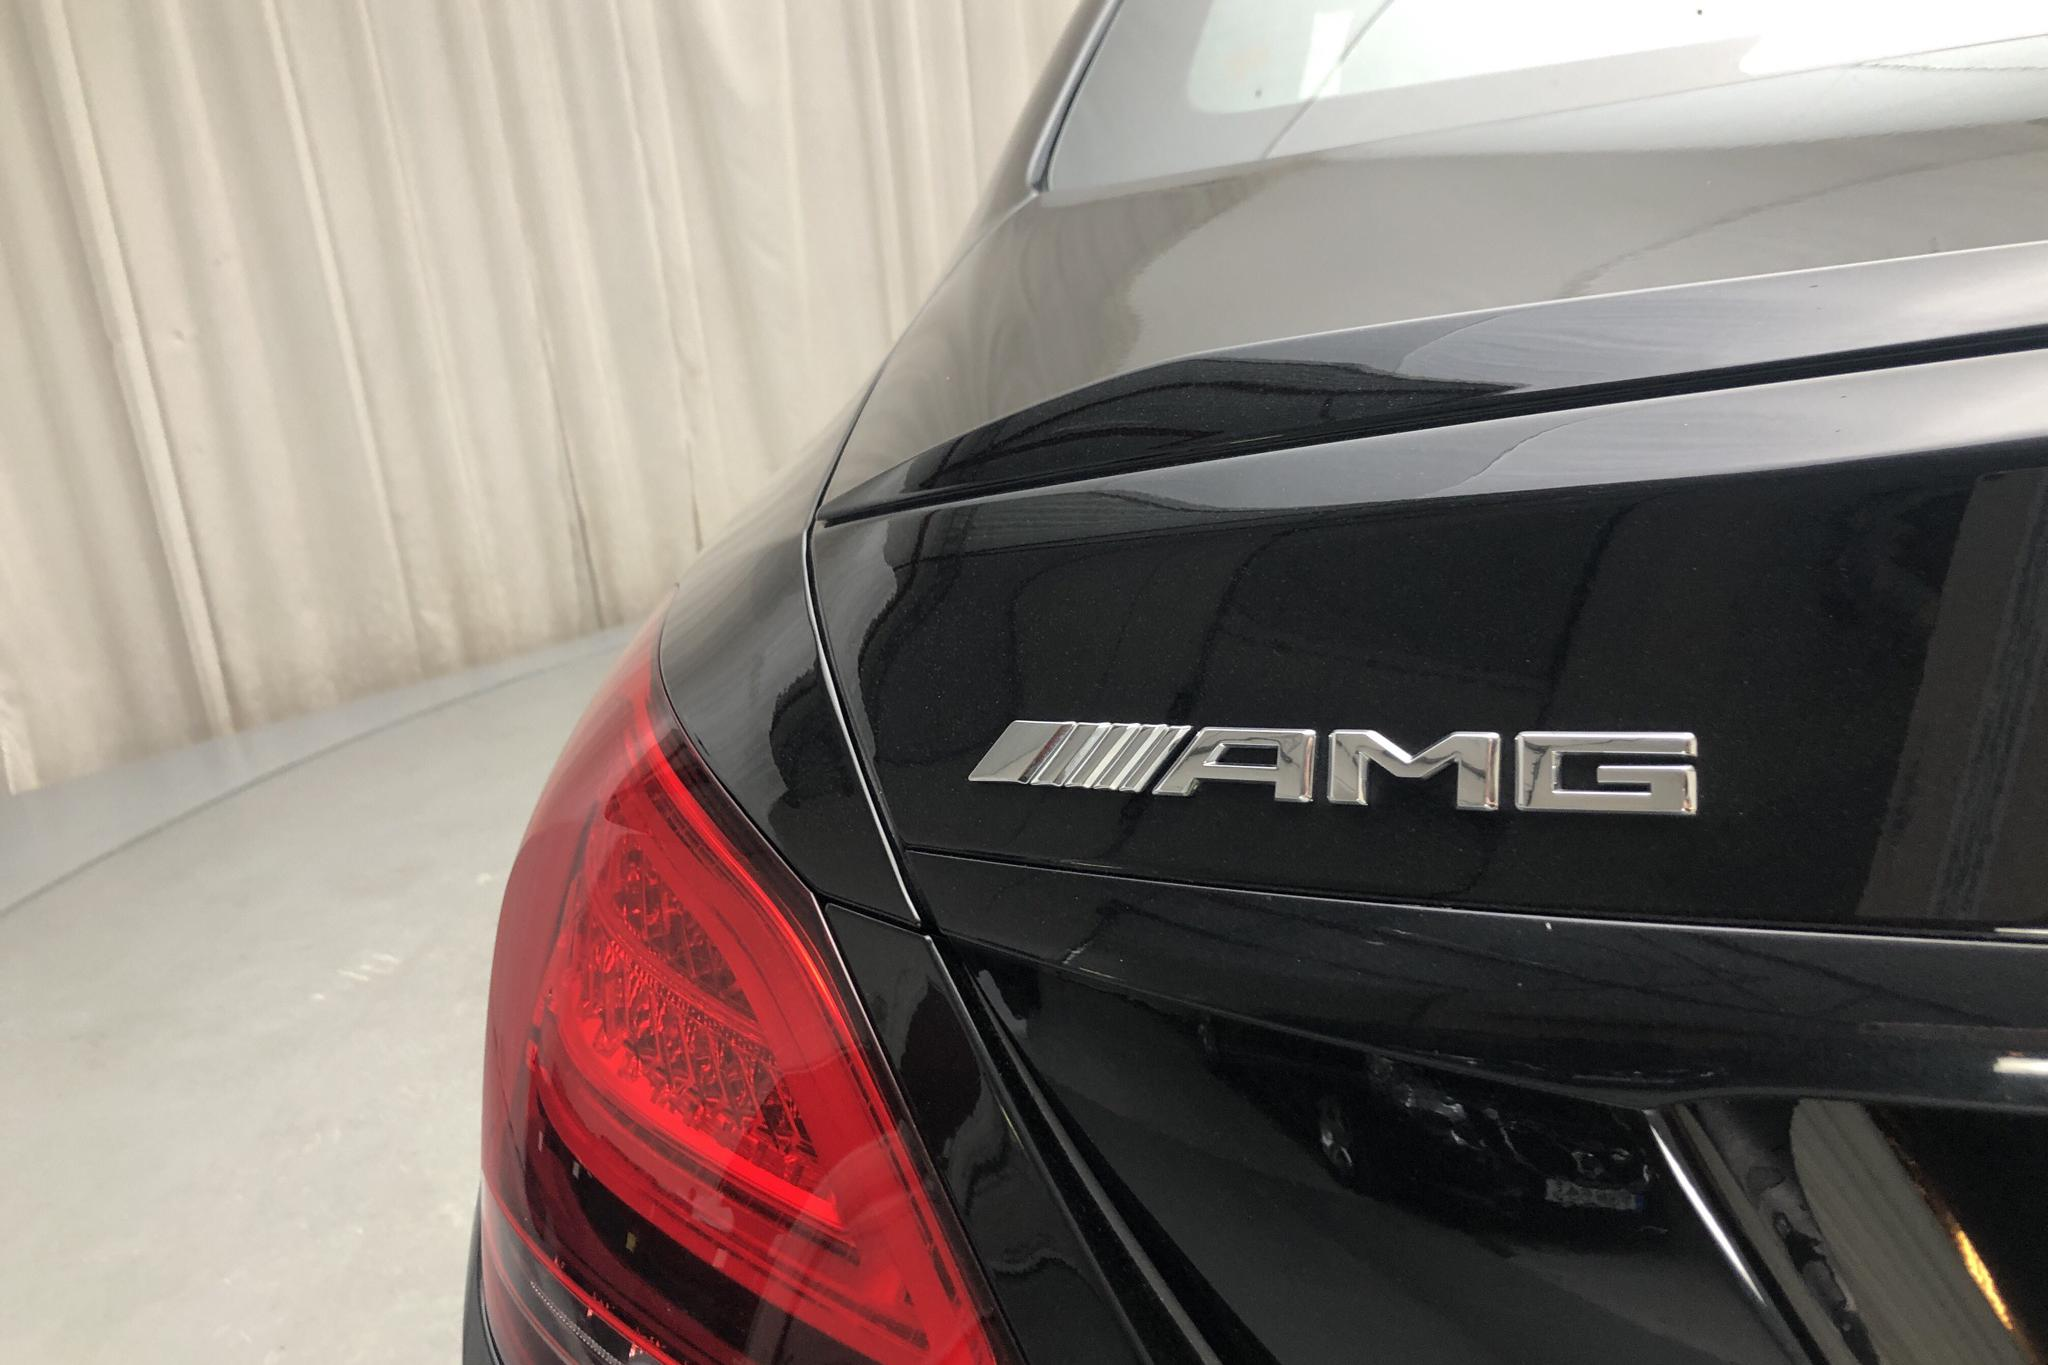 Mercedes C 63 AMG W205 (476hk) - 944 mil - Automat - svart